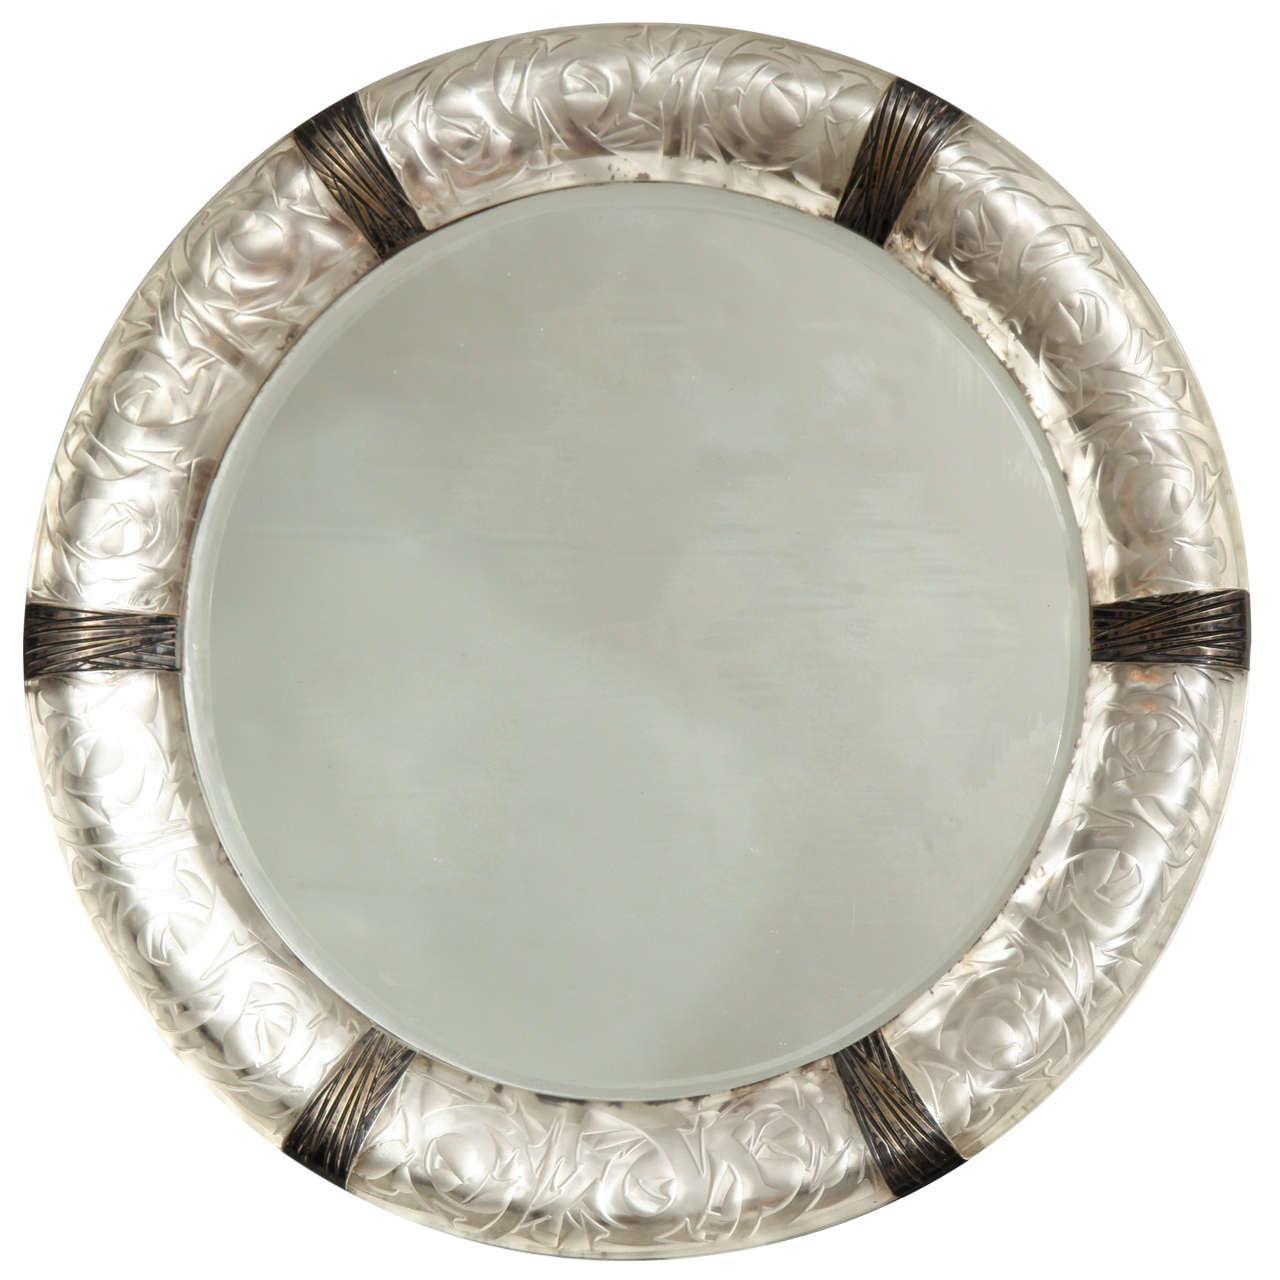 "A Rare Rene Lalique Wall Mirror ""Epines"""